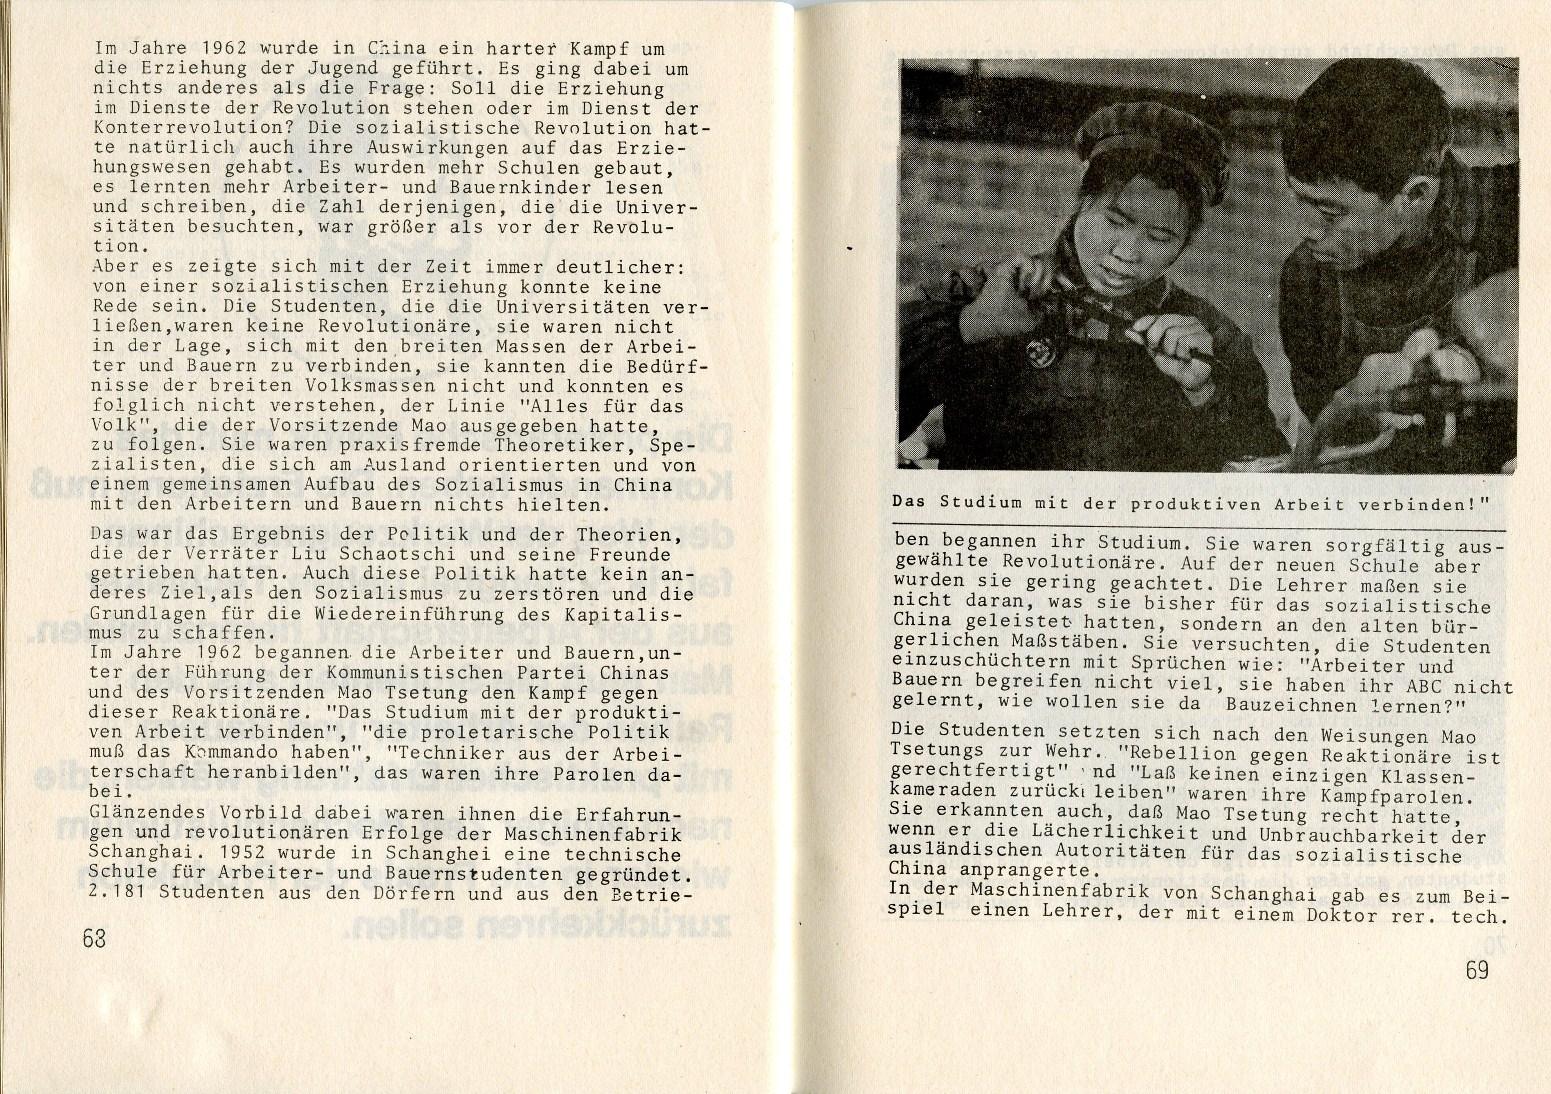 ZB_KPChinas_1971_36